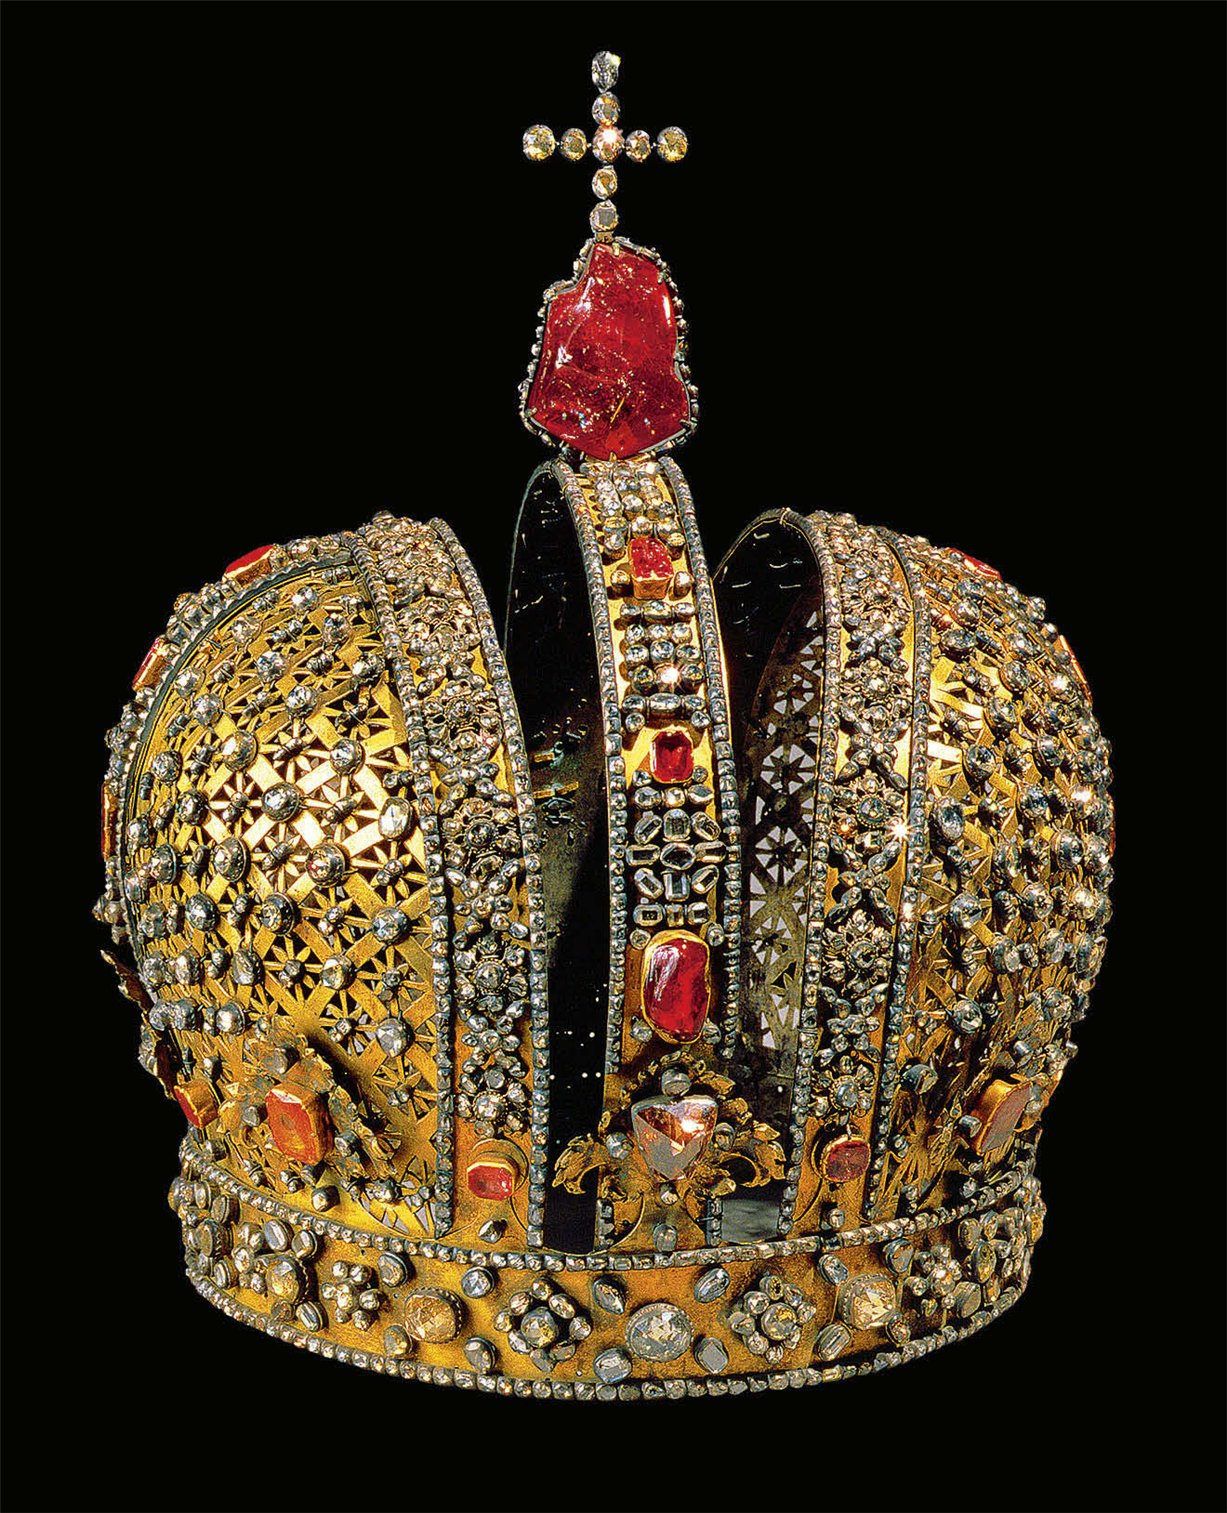 Crown / Корона Анны Иоанновны